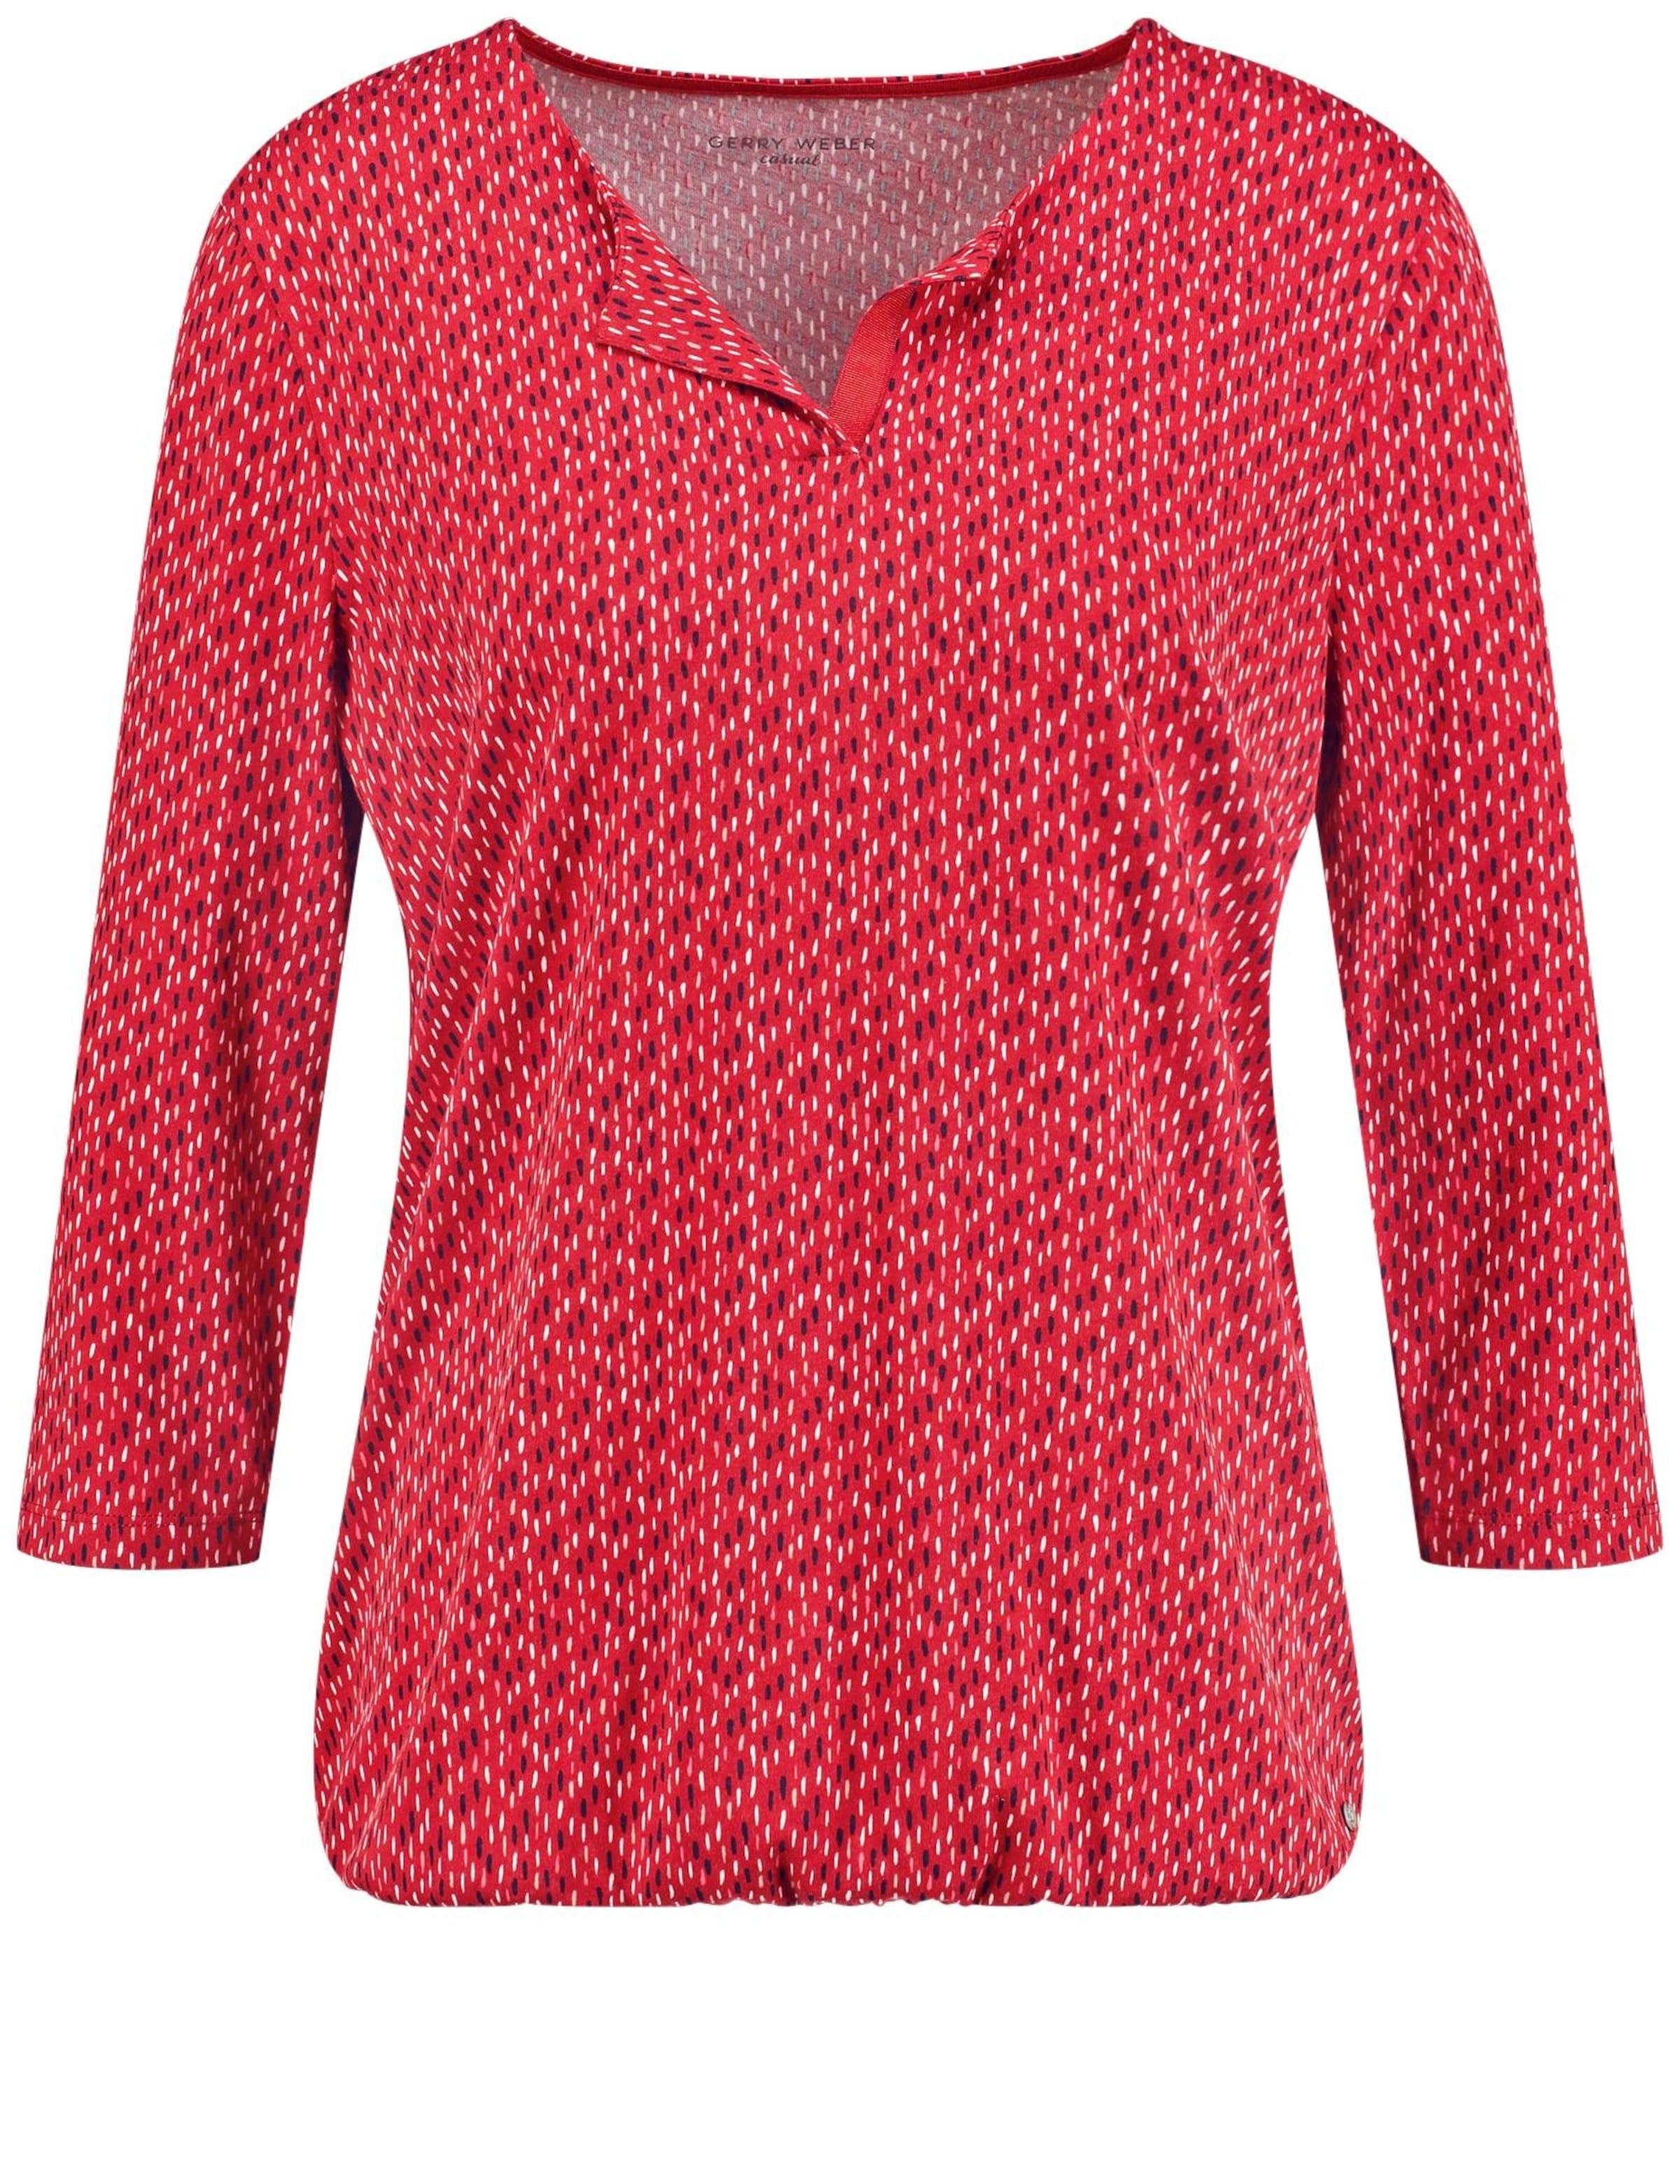 Weber Gerry T shirt RotWeiß In nwPNOyvm80